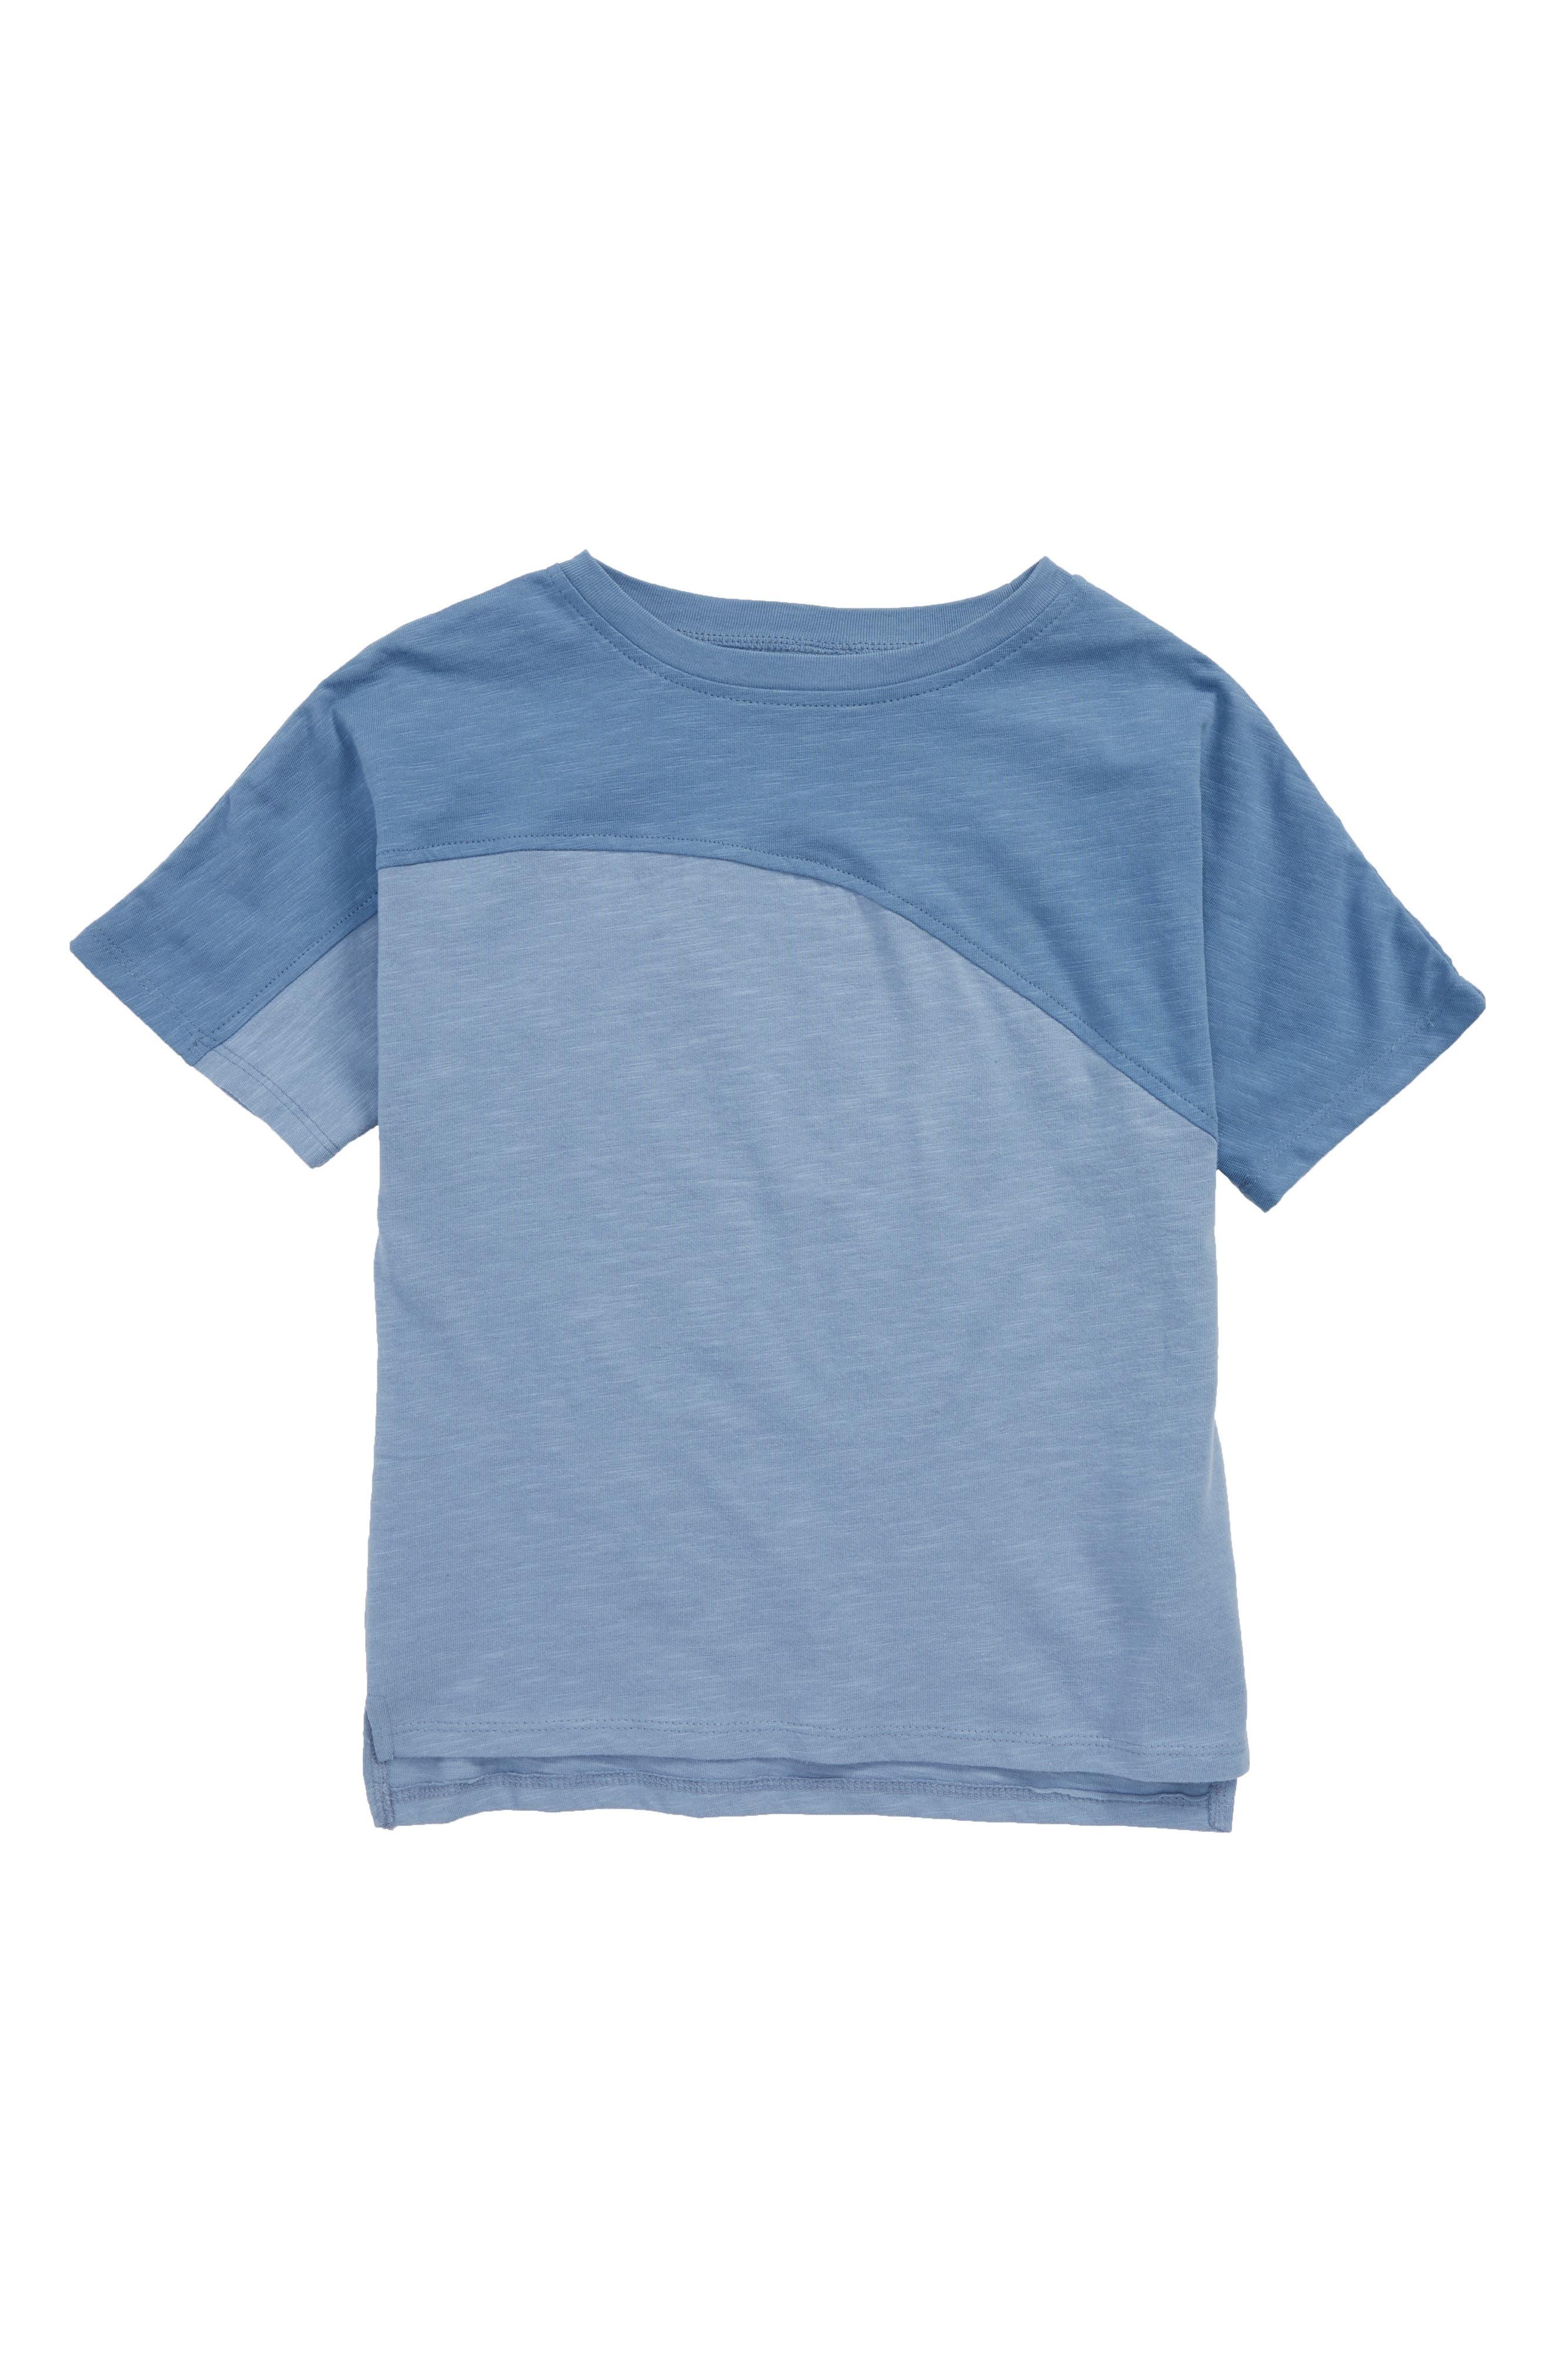 Main Image - Stem Diagonal Washed T-Shirt (Toddler Boys, Little Boys & Big Boys)